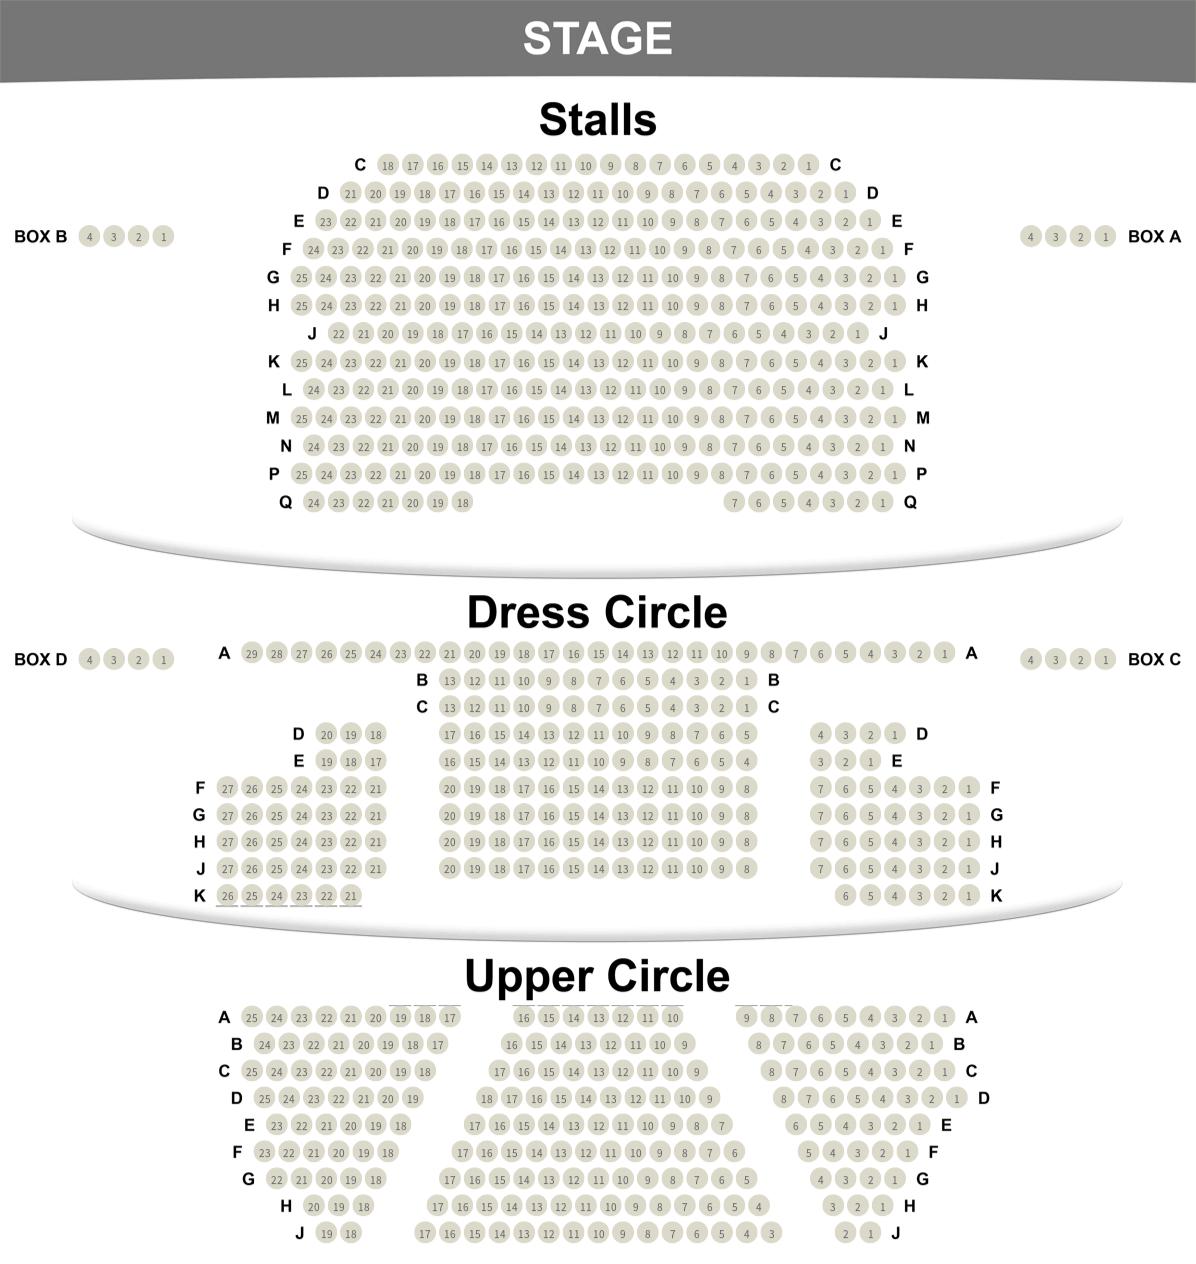 Playhouse Theatre seating plan